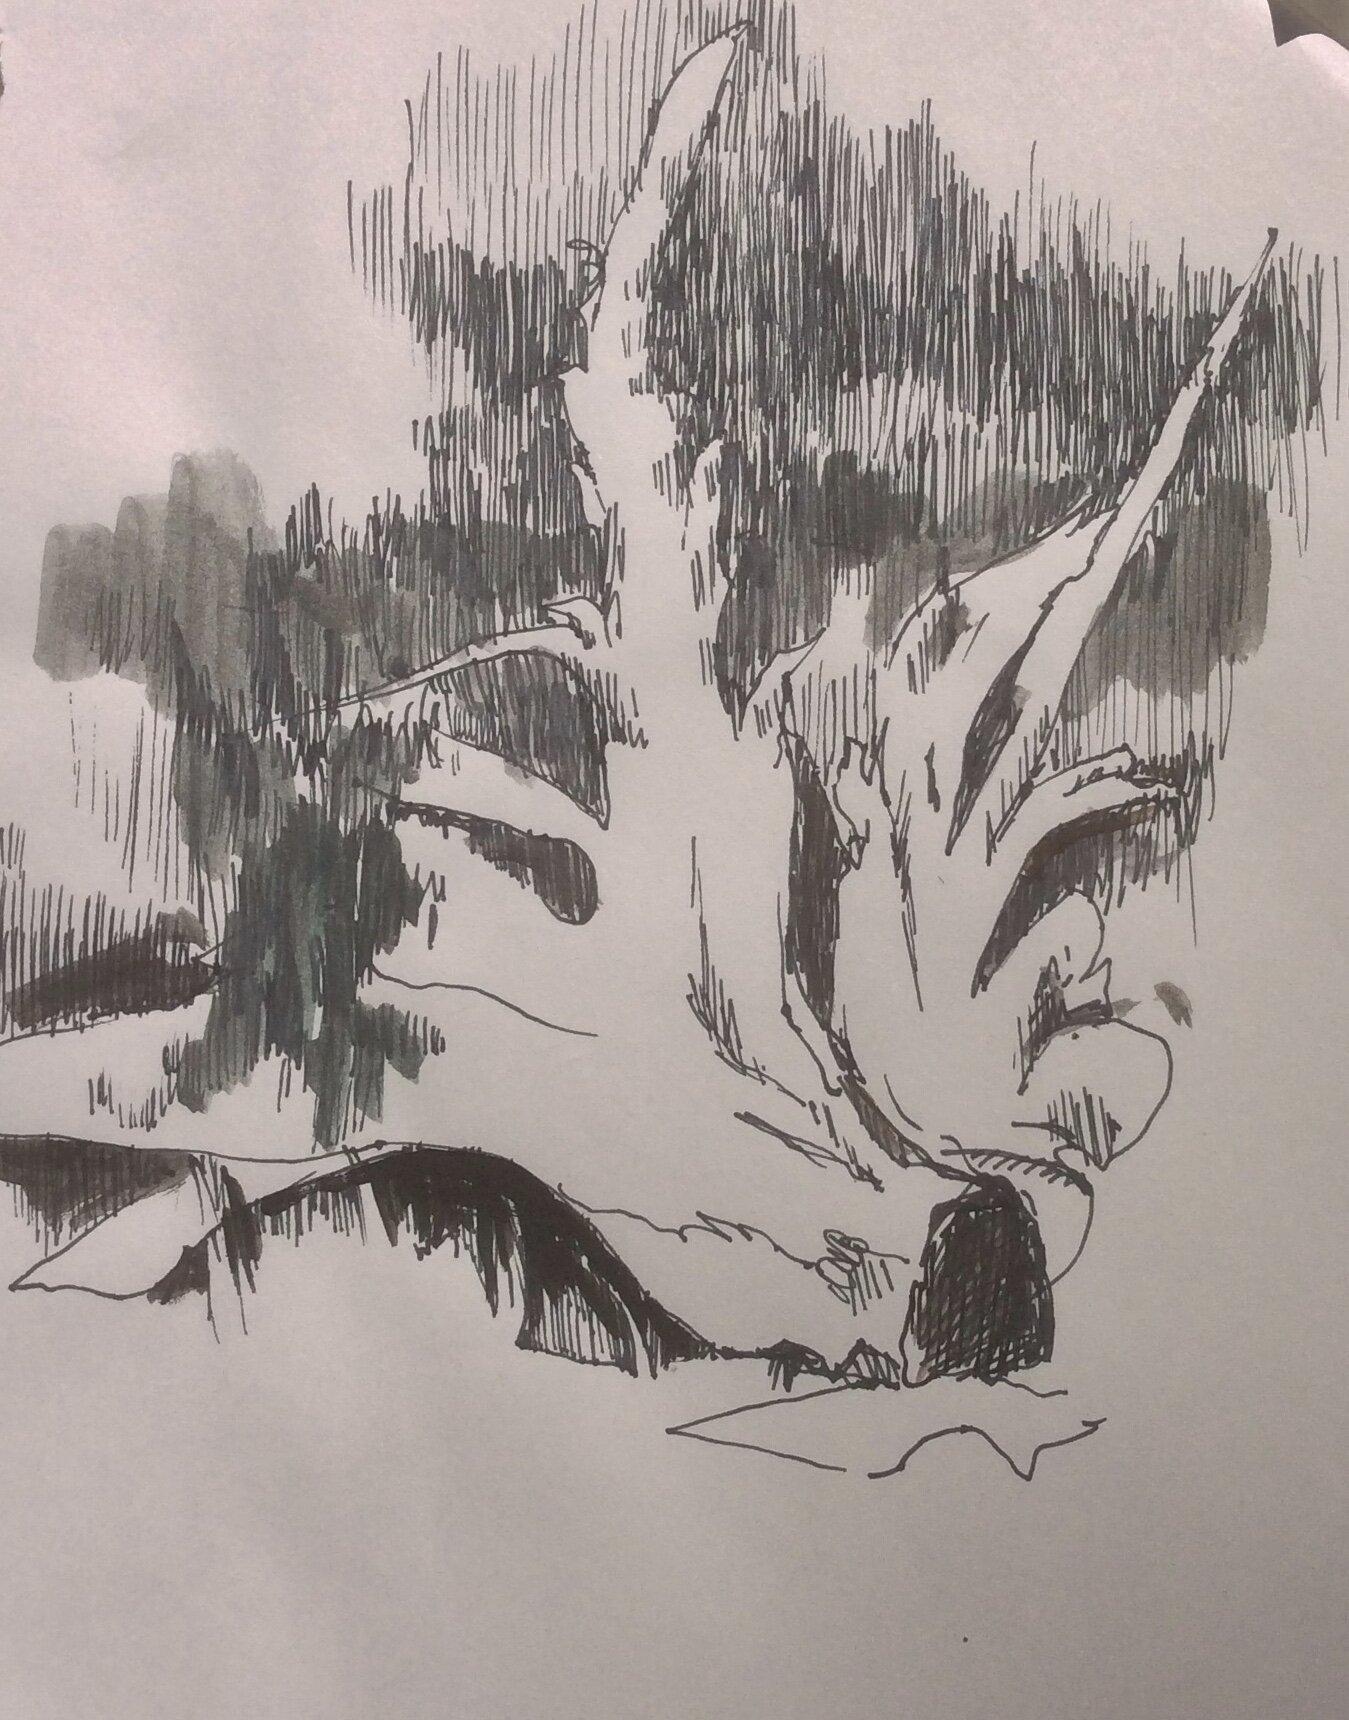 Alaska Sketch 14